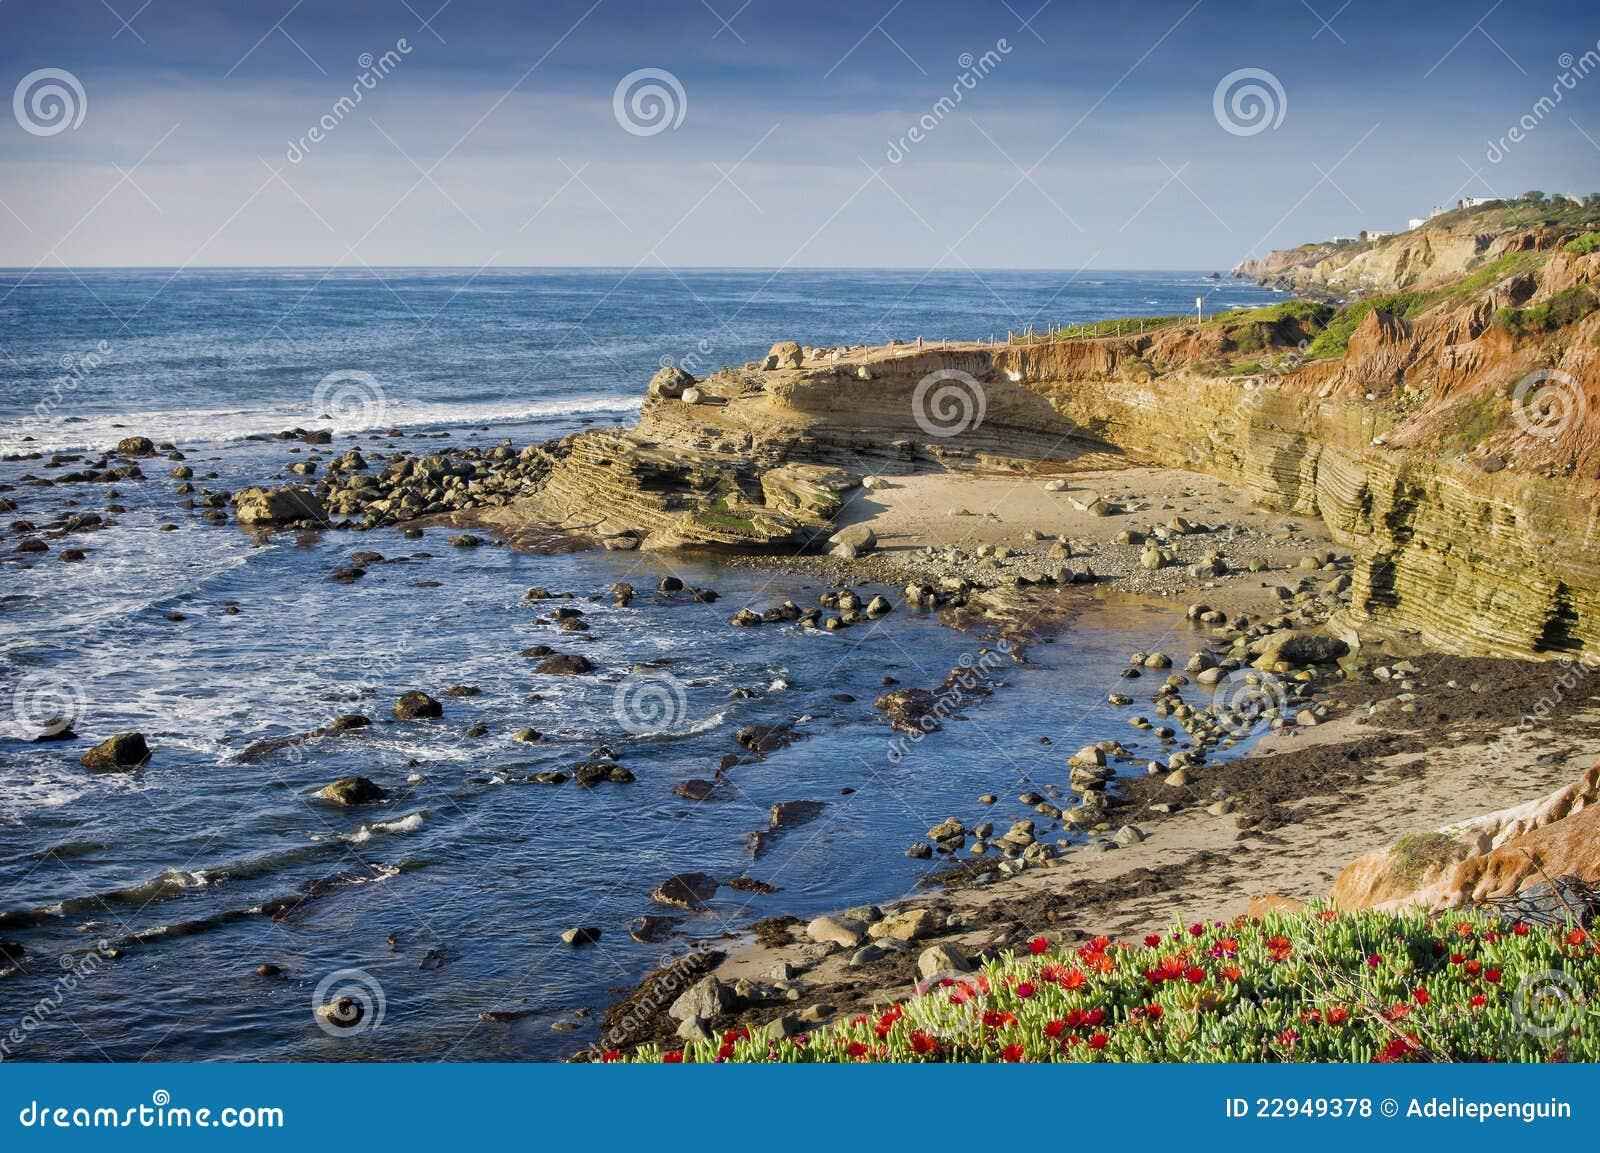 Pacific Ocean California, HD Flowers, 4k Wallpapers ...  |Pacific Ocean California